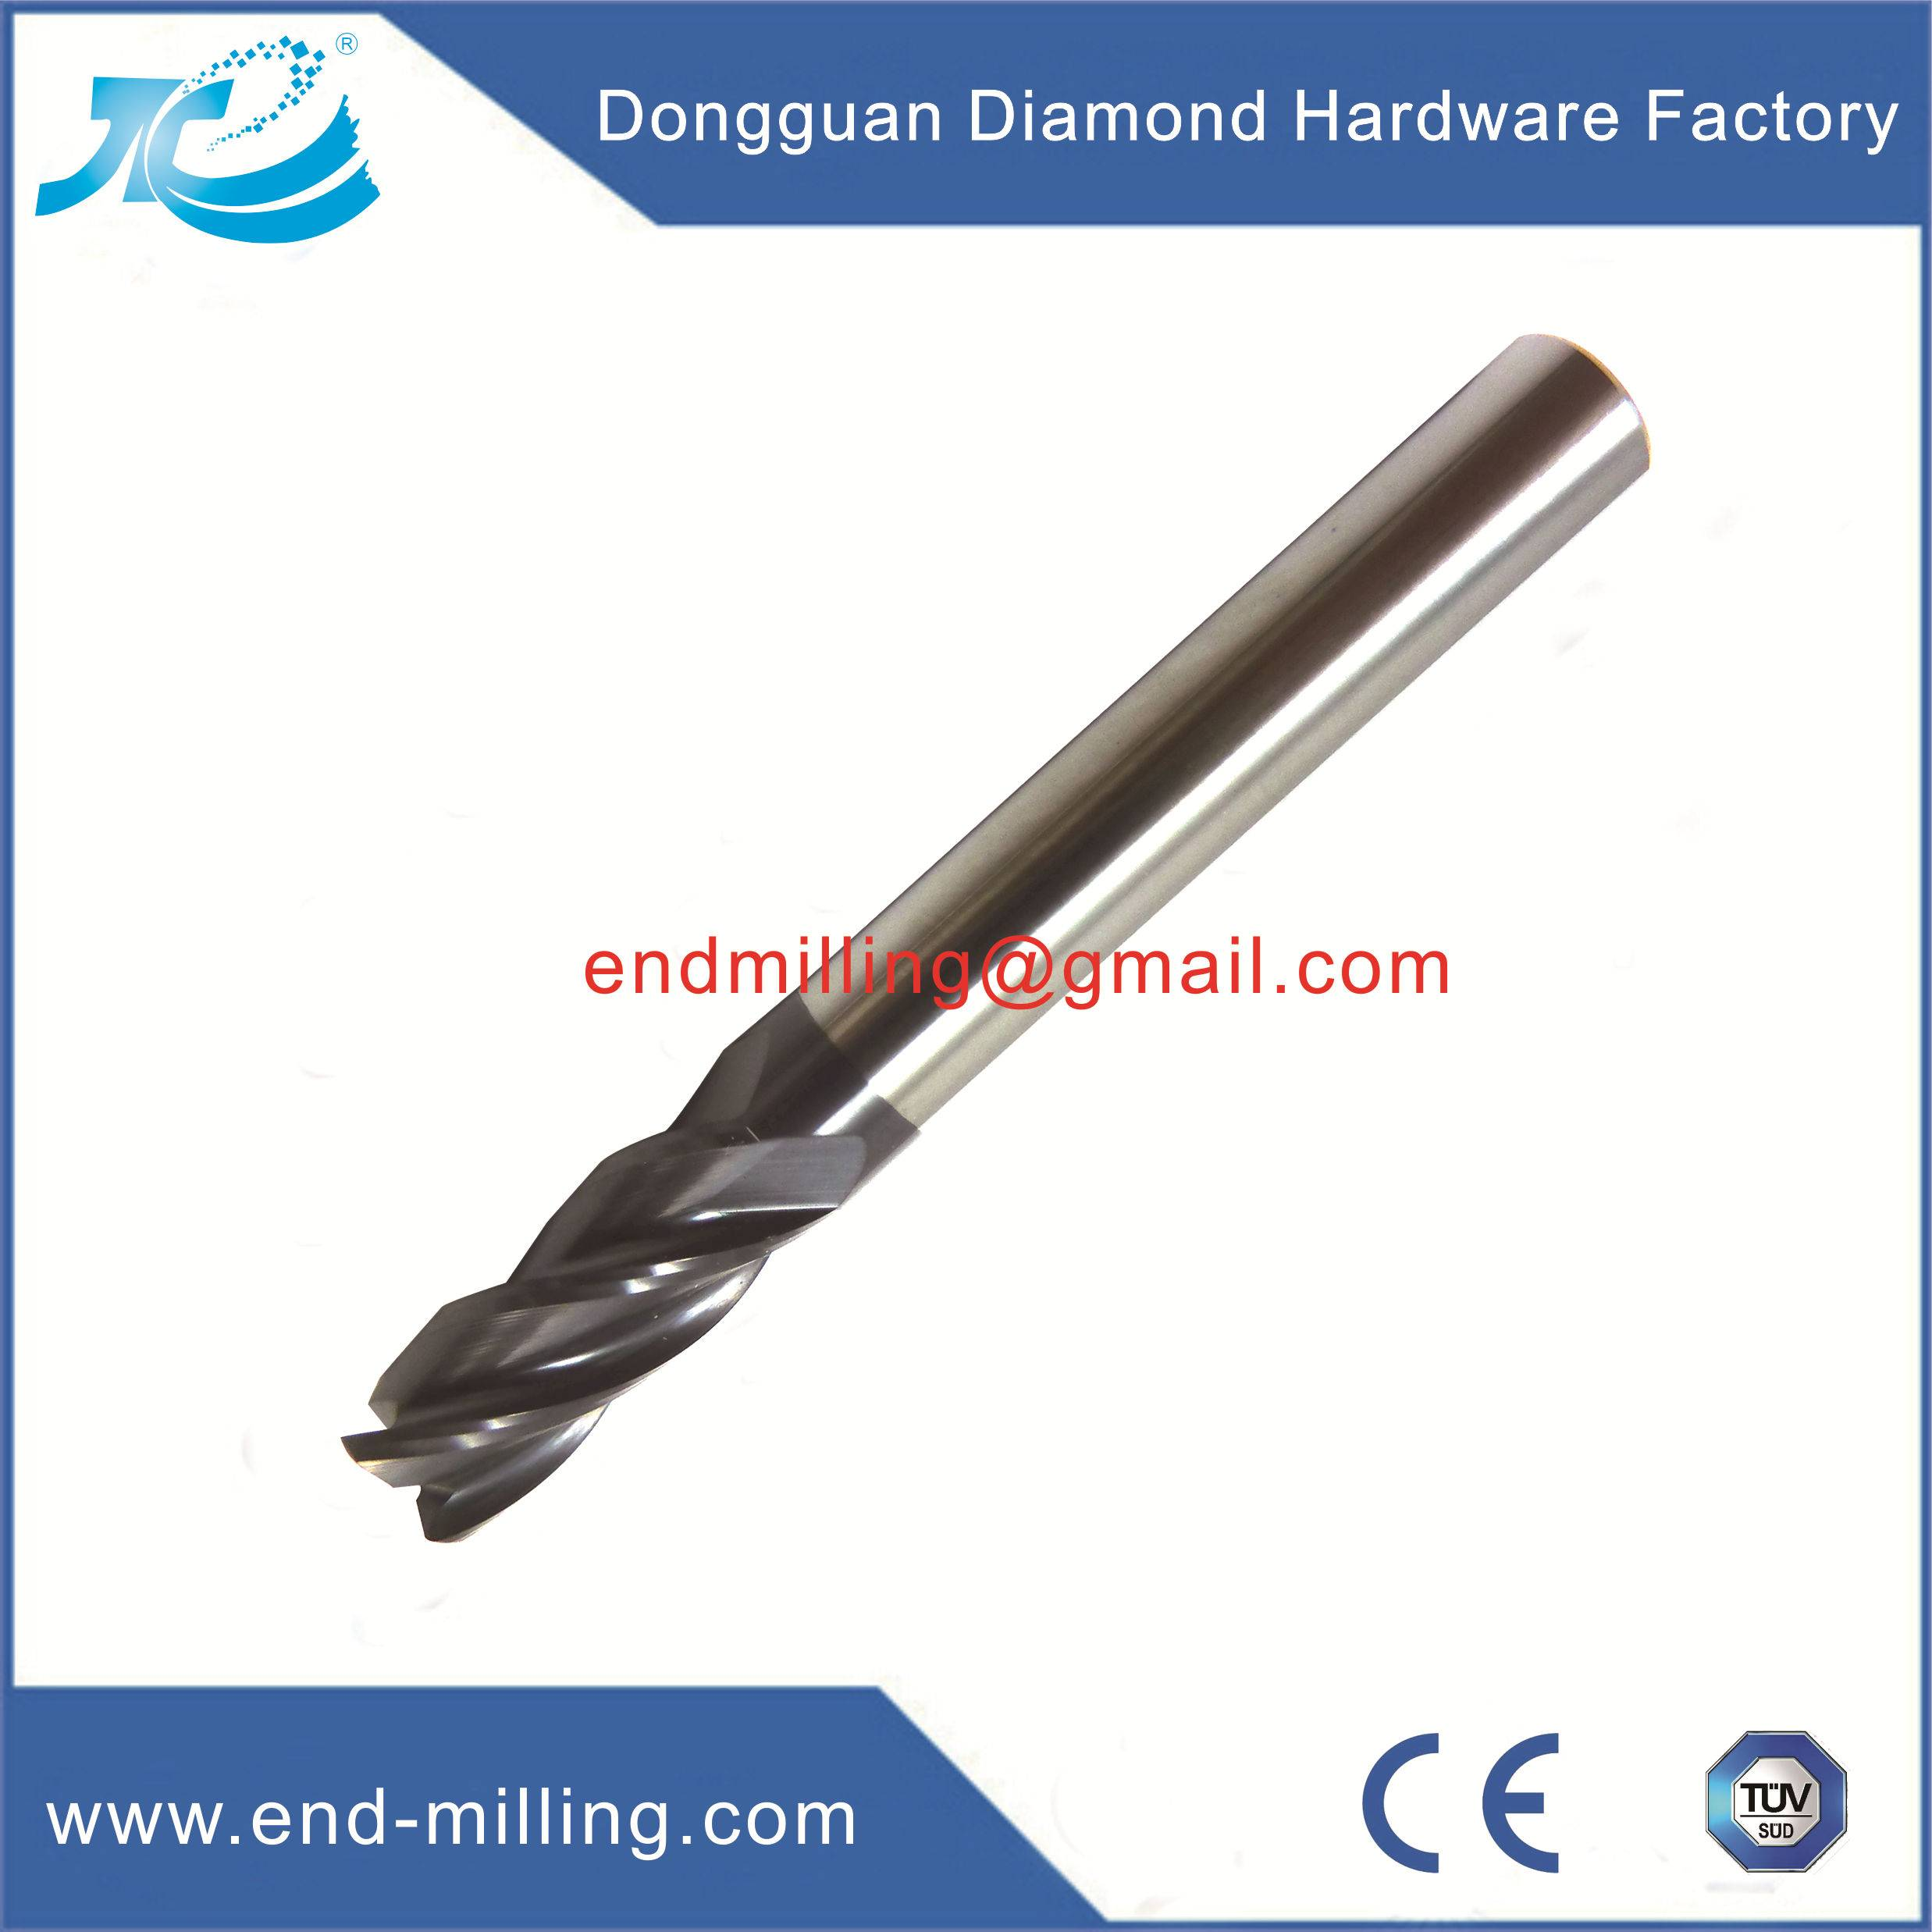 CNC End Mill Cutter 2/4 Flute Corner Radius End Mill Tungsten Steel